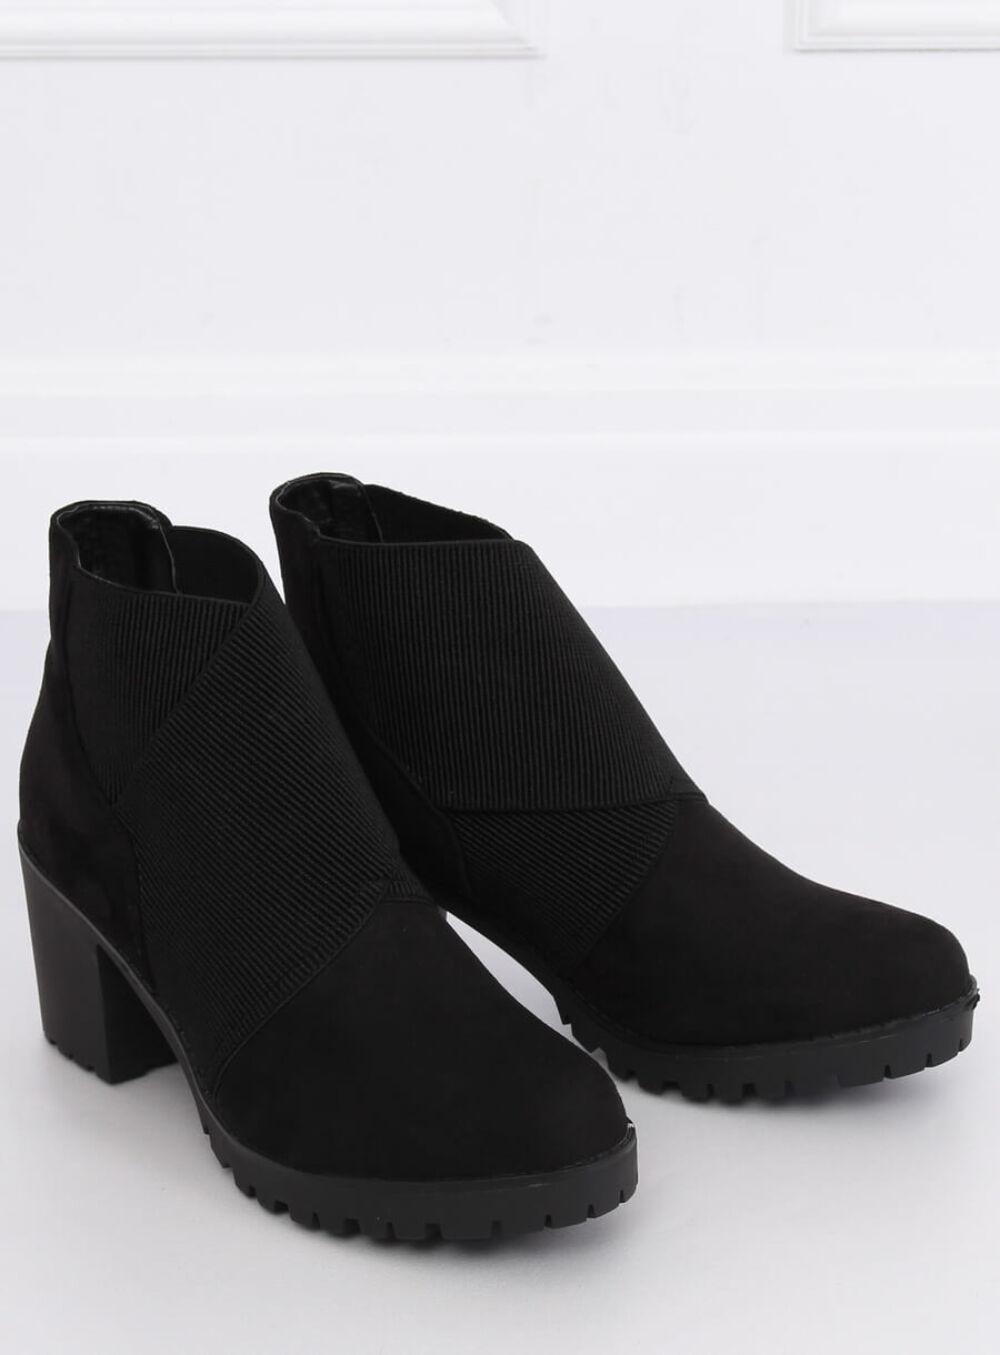 Női műbőr bokacsizma (BH151-KB), fekete